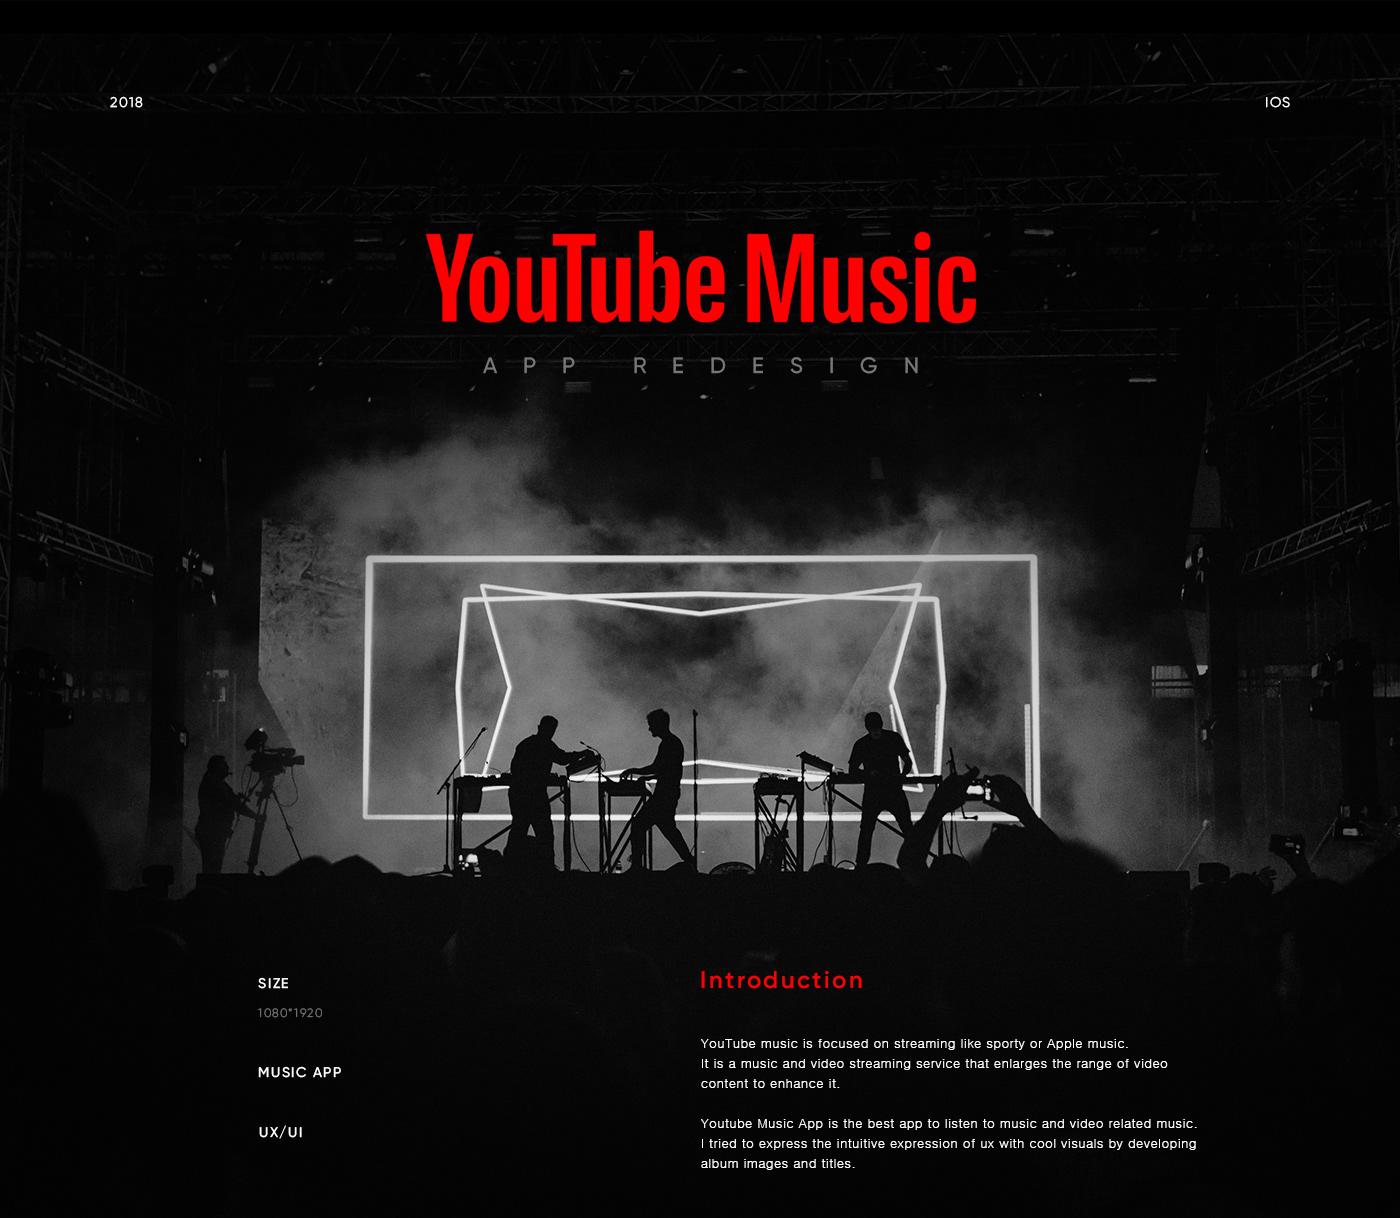 YouTube Music app redesign on Behance